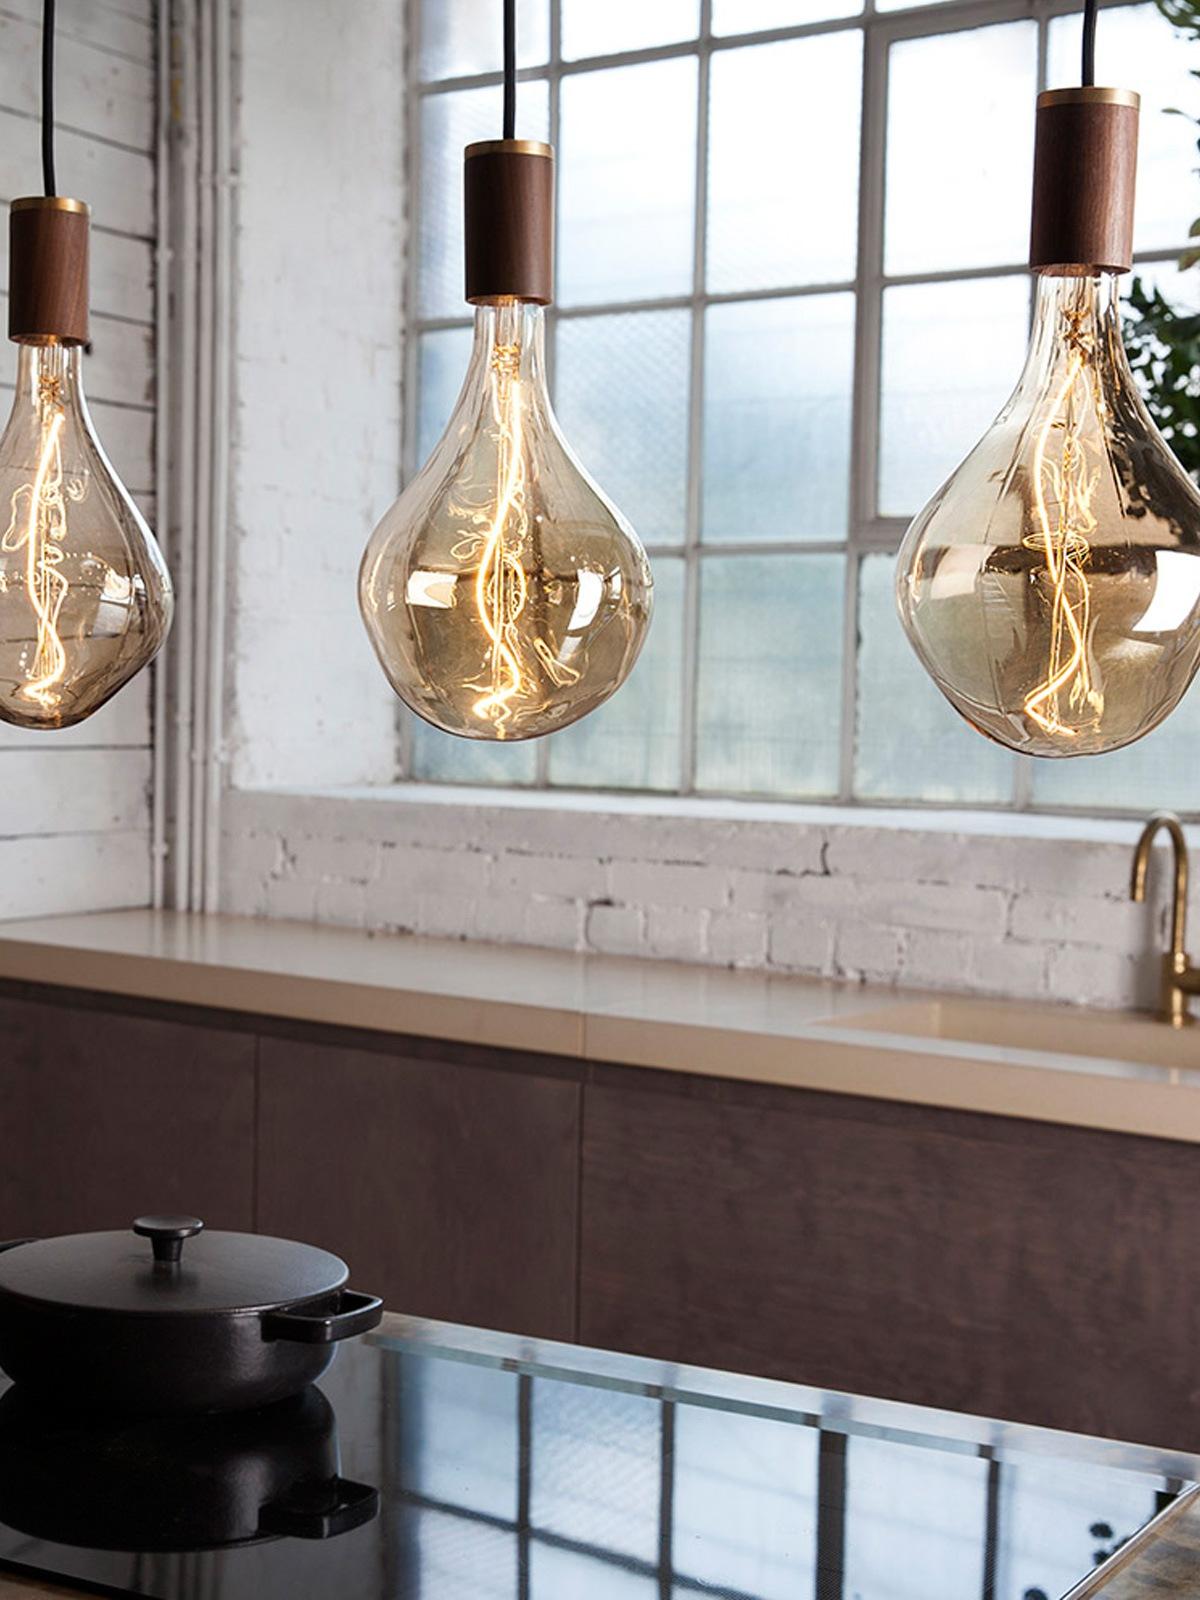 DesignOrt Blog: Pendant Light Holz Tala DesignOrt Lampen Onlineshop Berlin